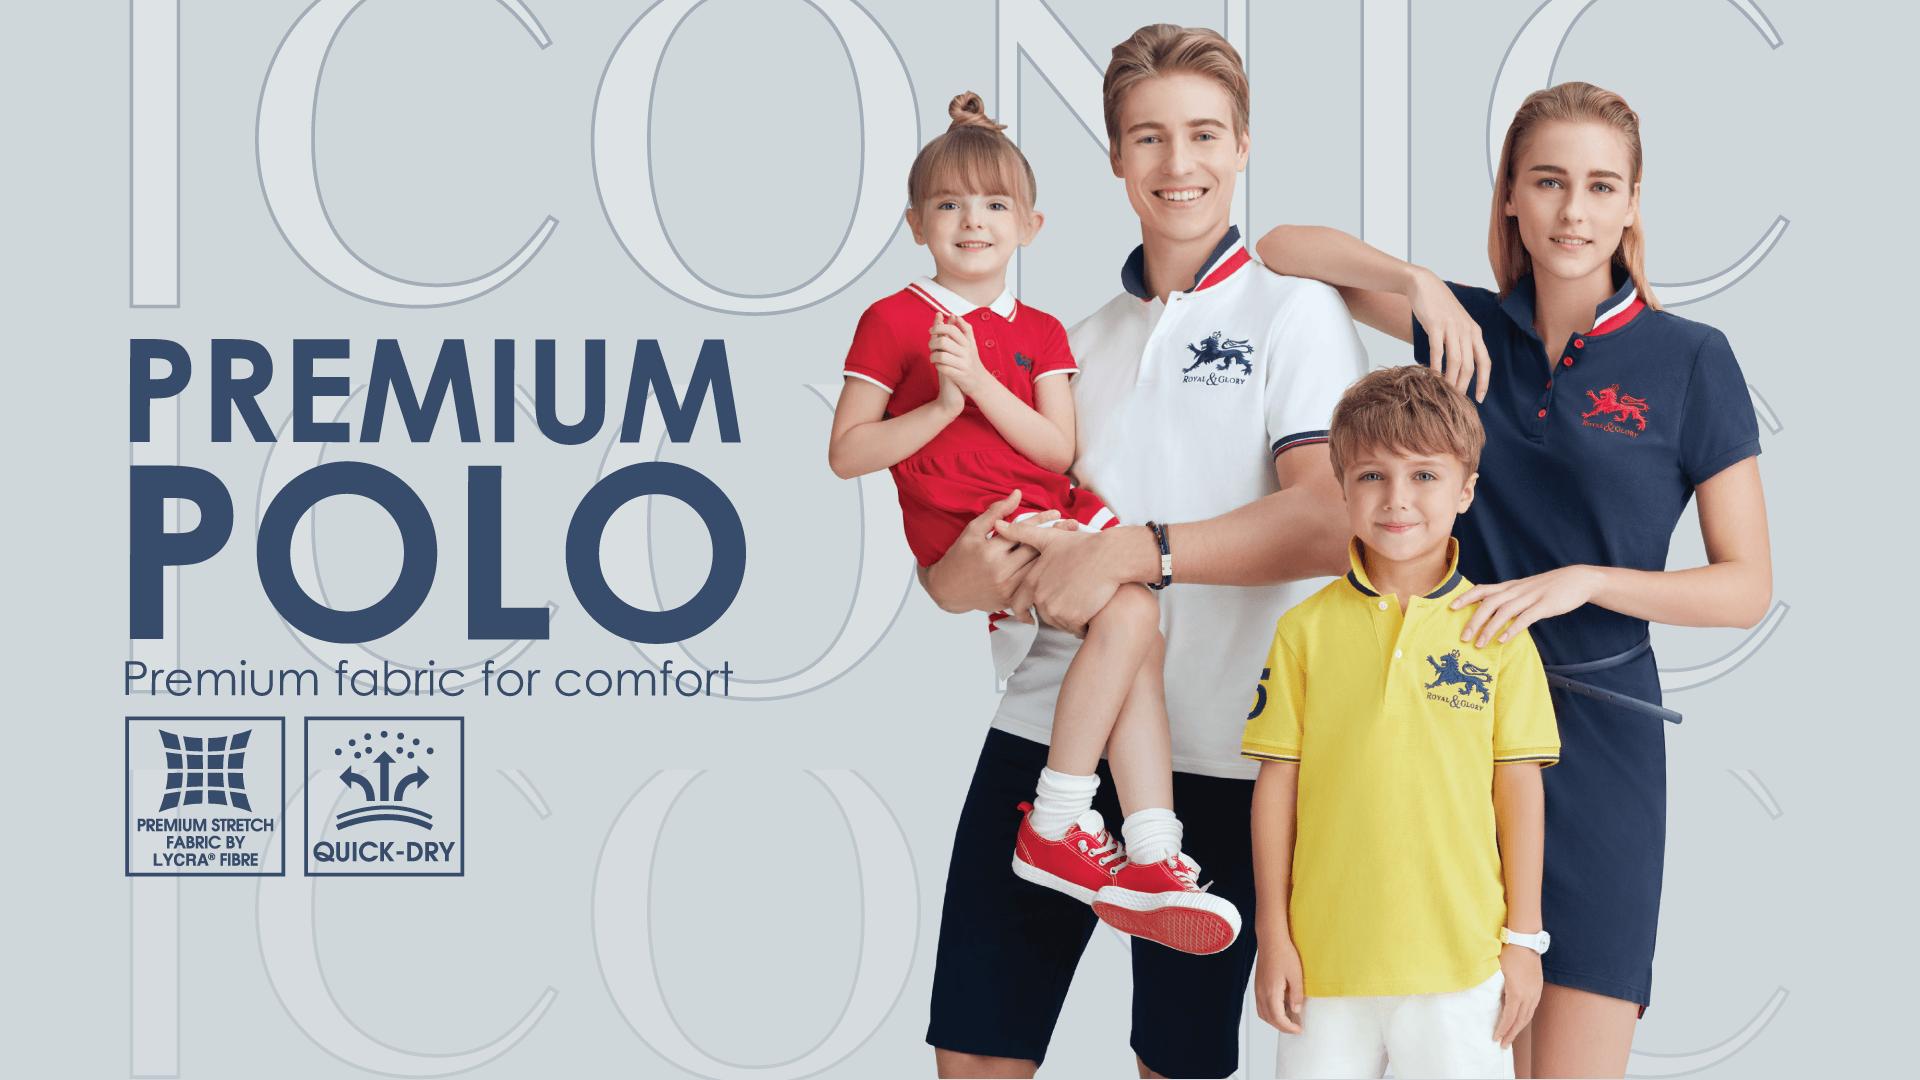 Premium polo_Web banner-1